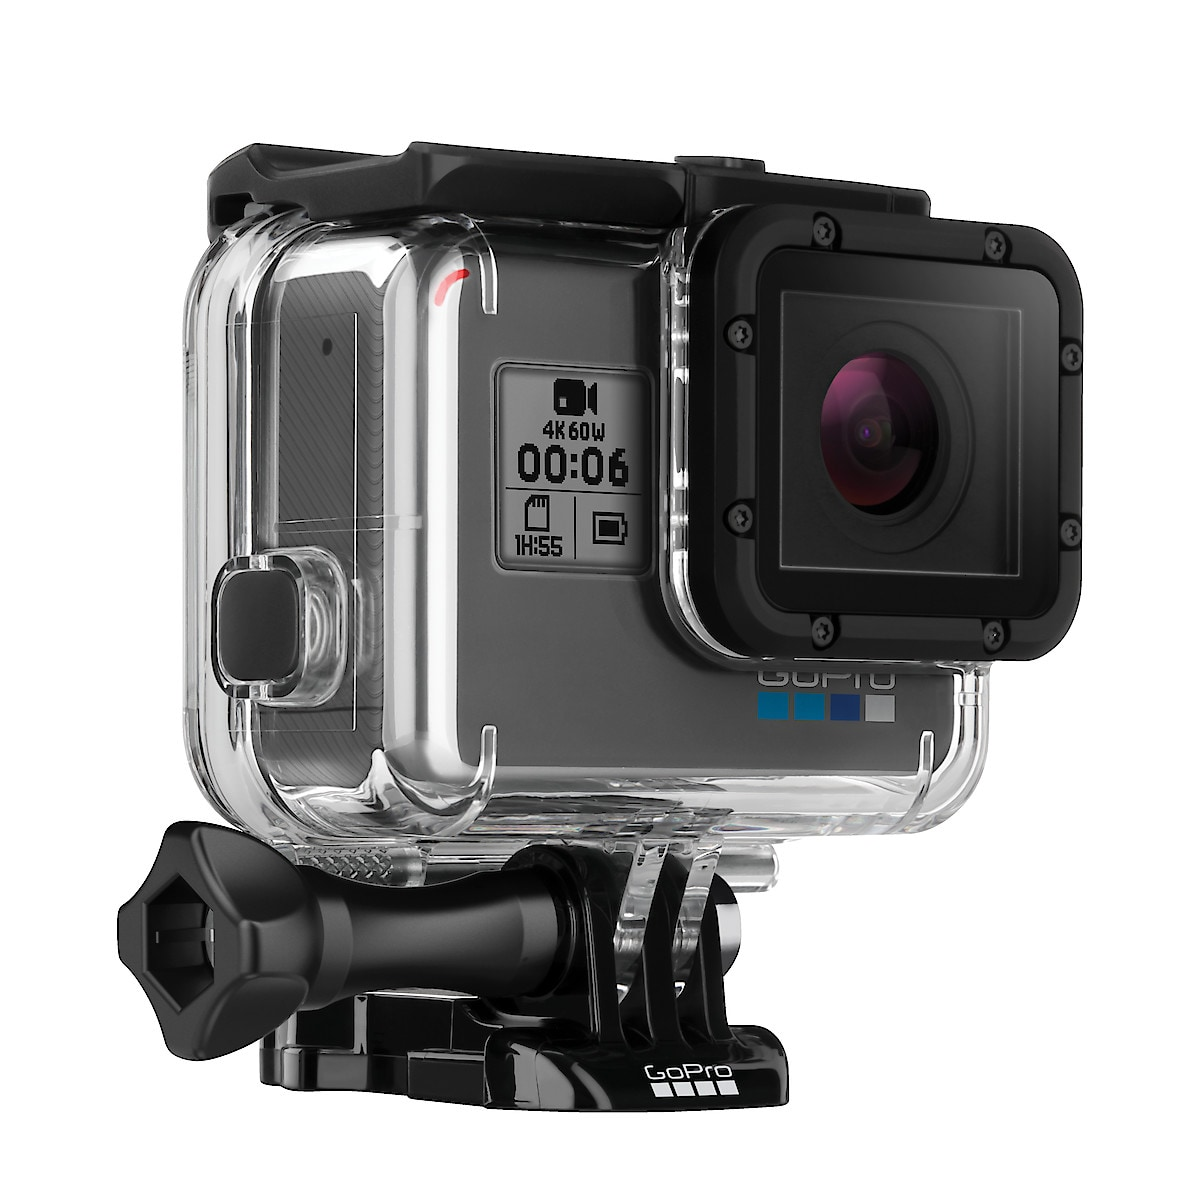 Undervattenshus GoPro Super Suit